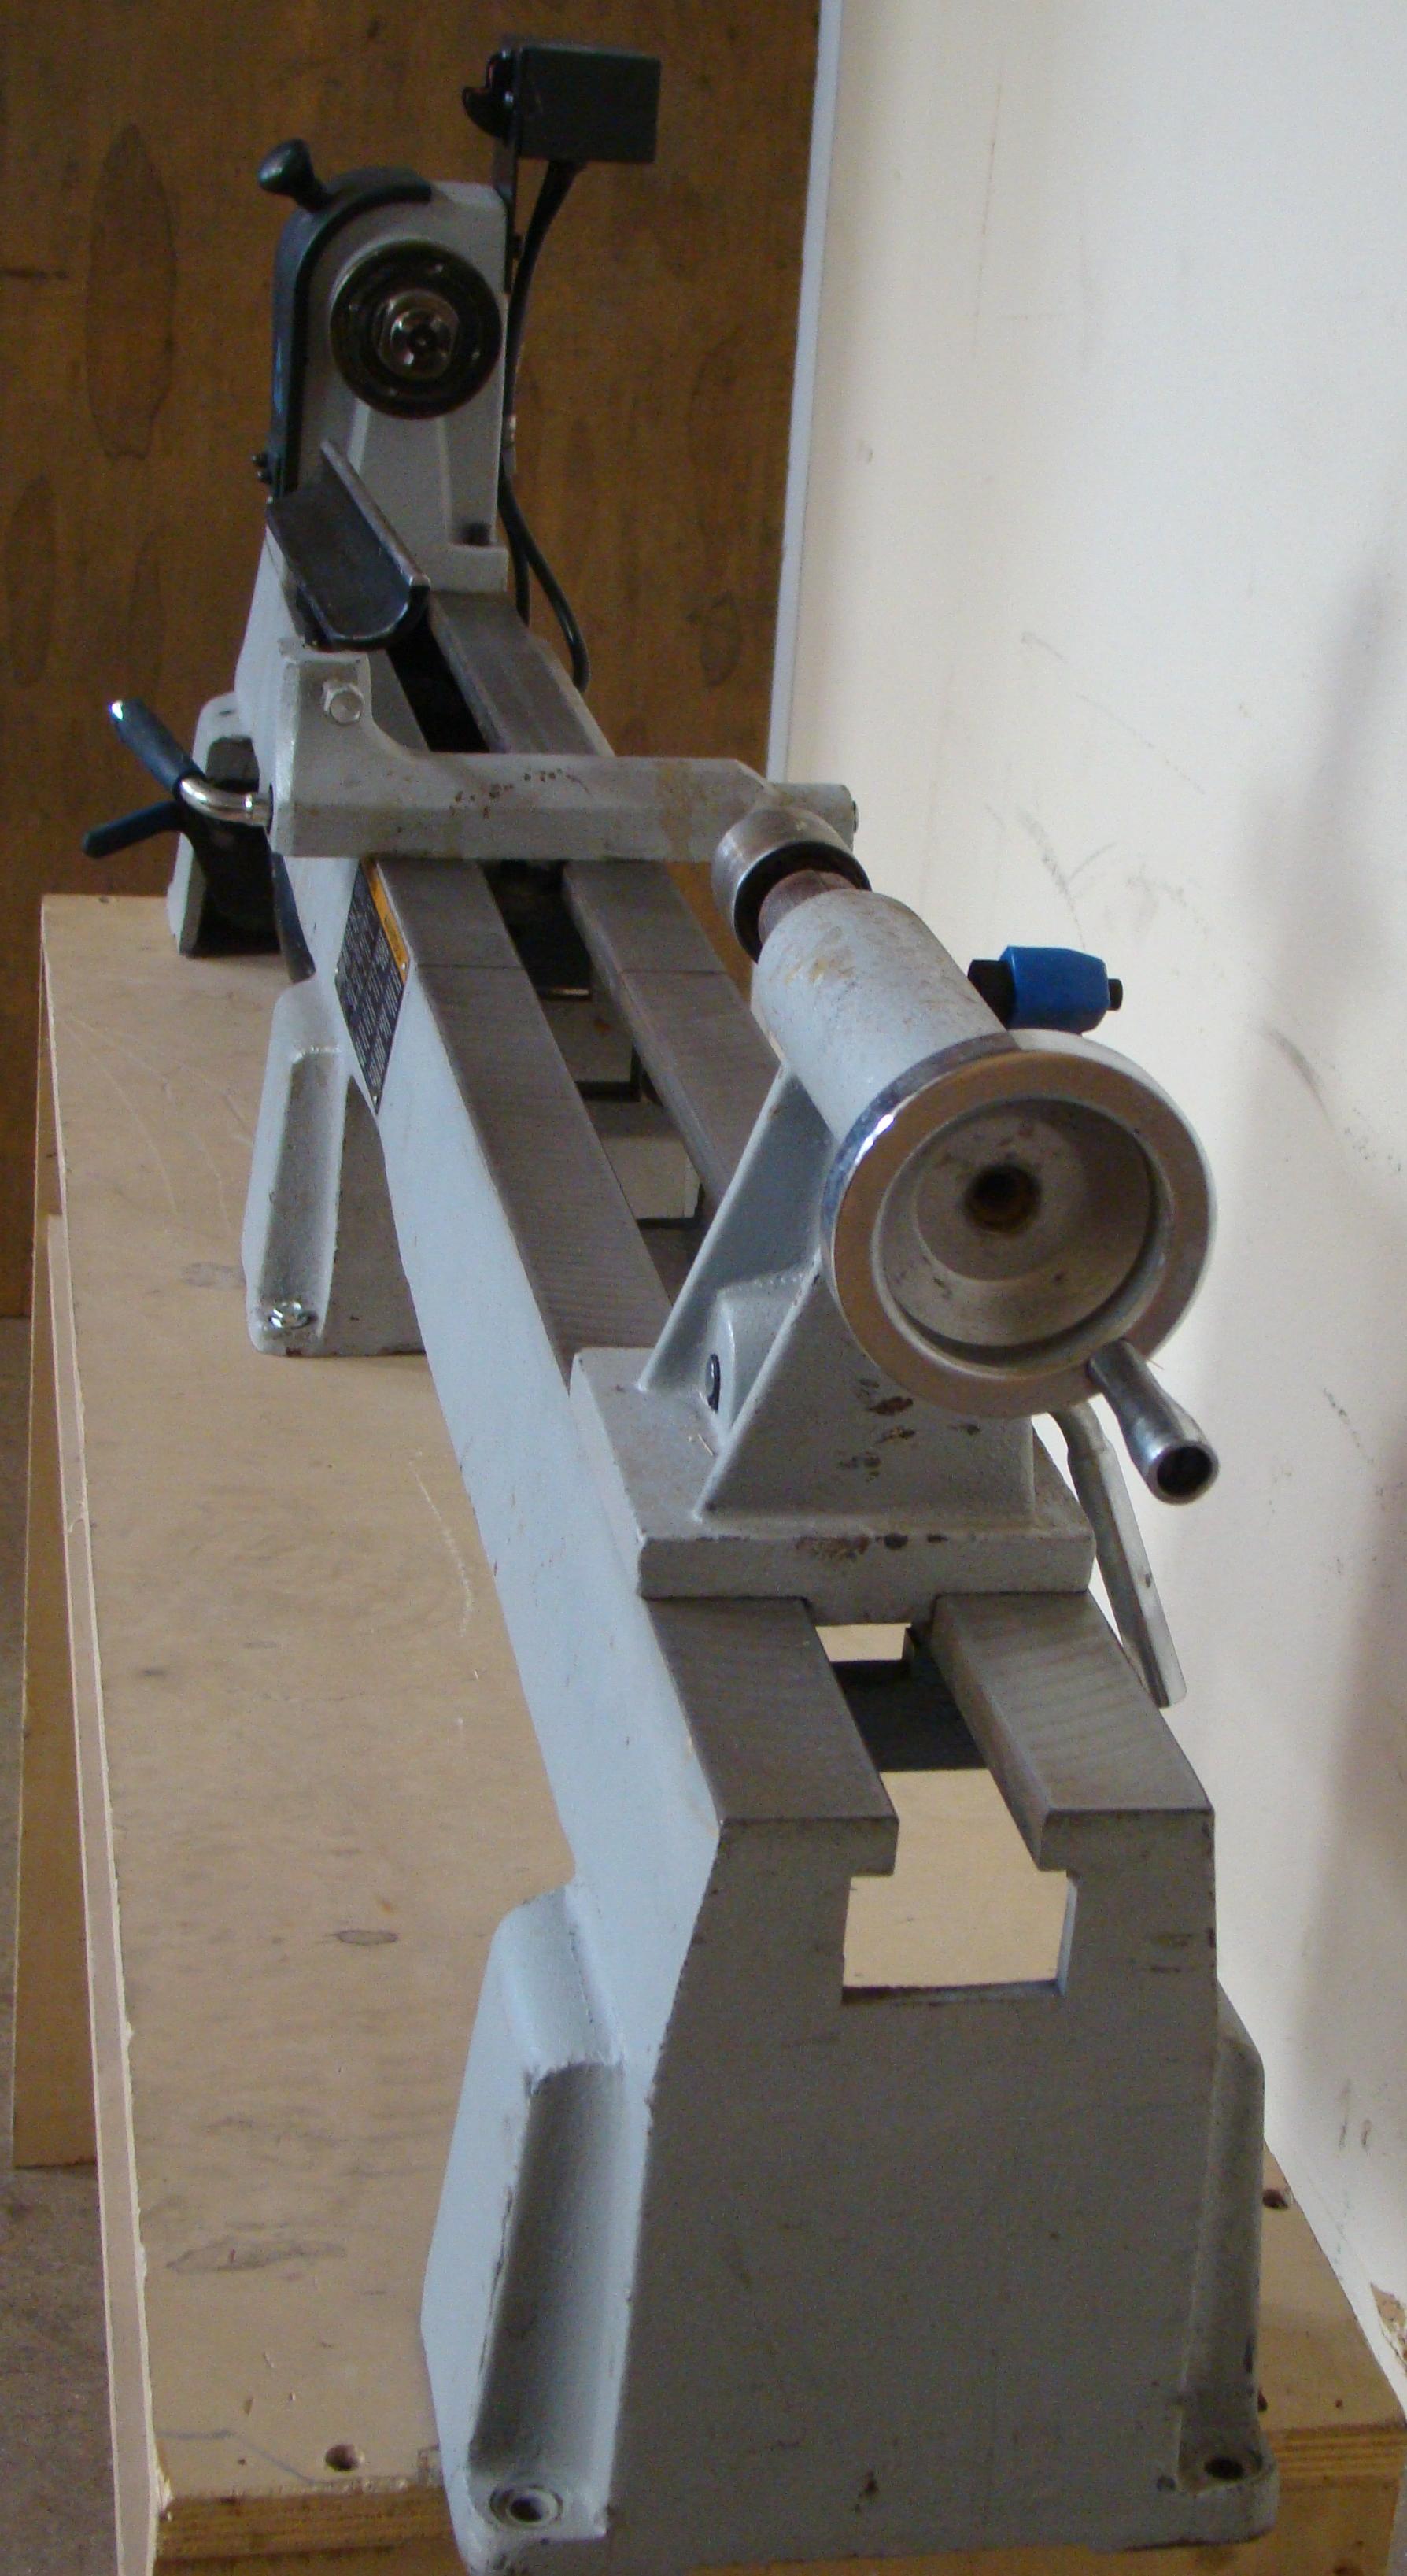 Delta Wood Lathe Model LA200 1/2 HP 120V 1PH - Image 2 of 9